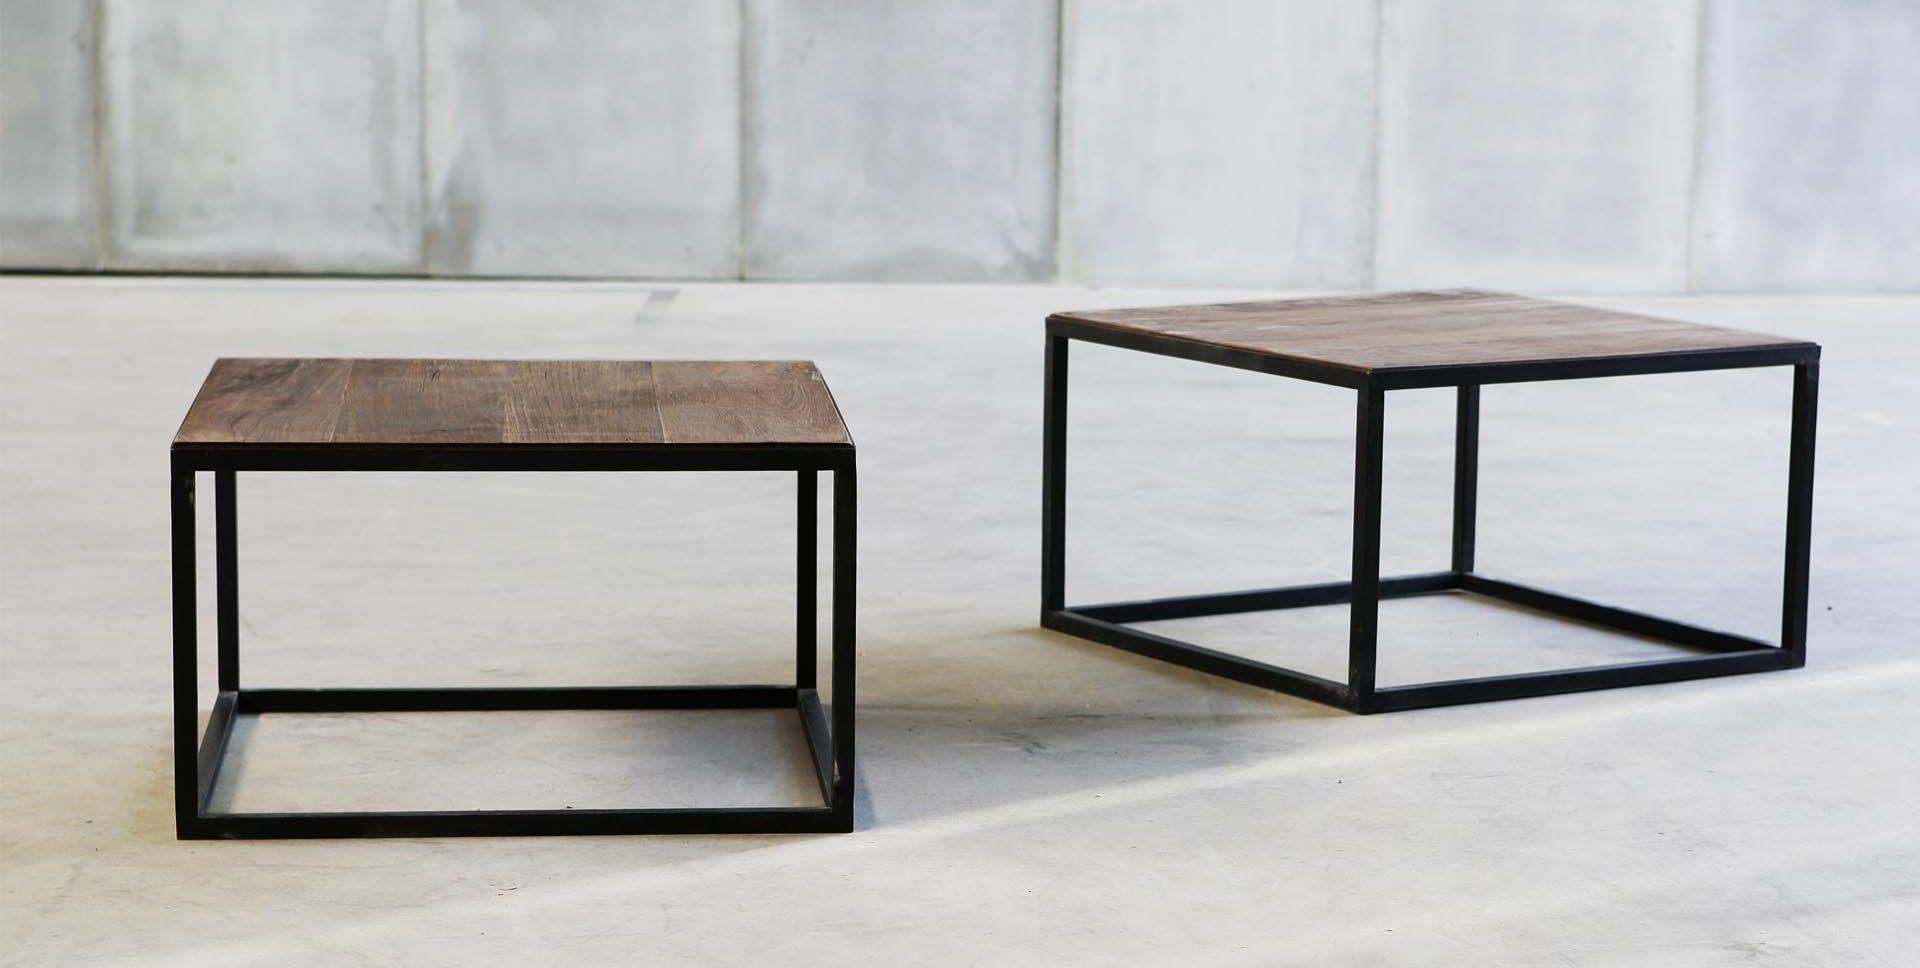 Moderne Couchtisch Holz Metall Rechteckig